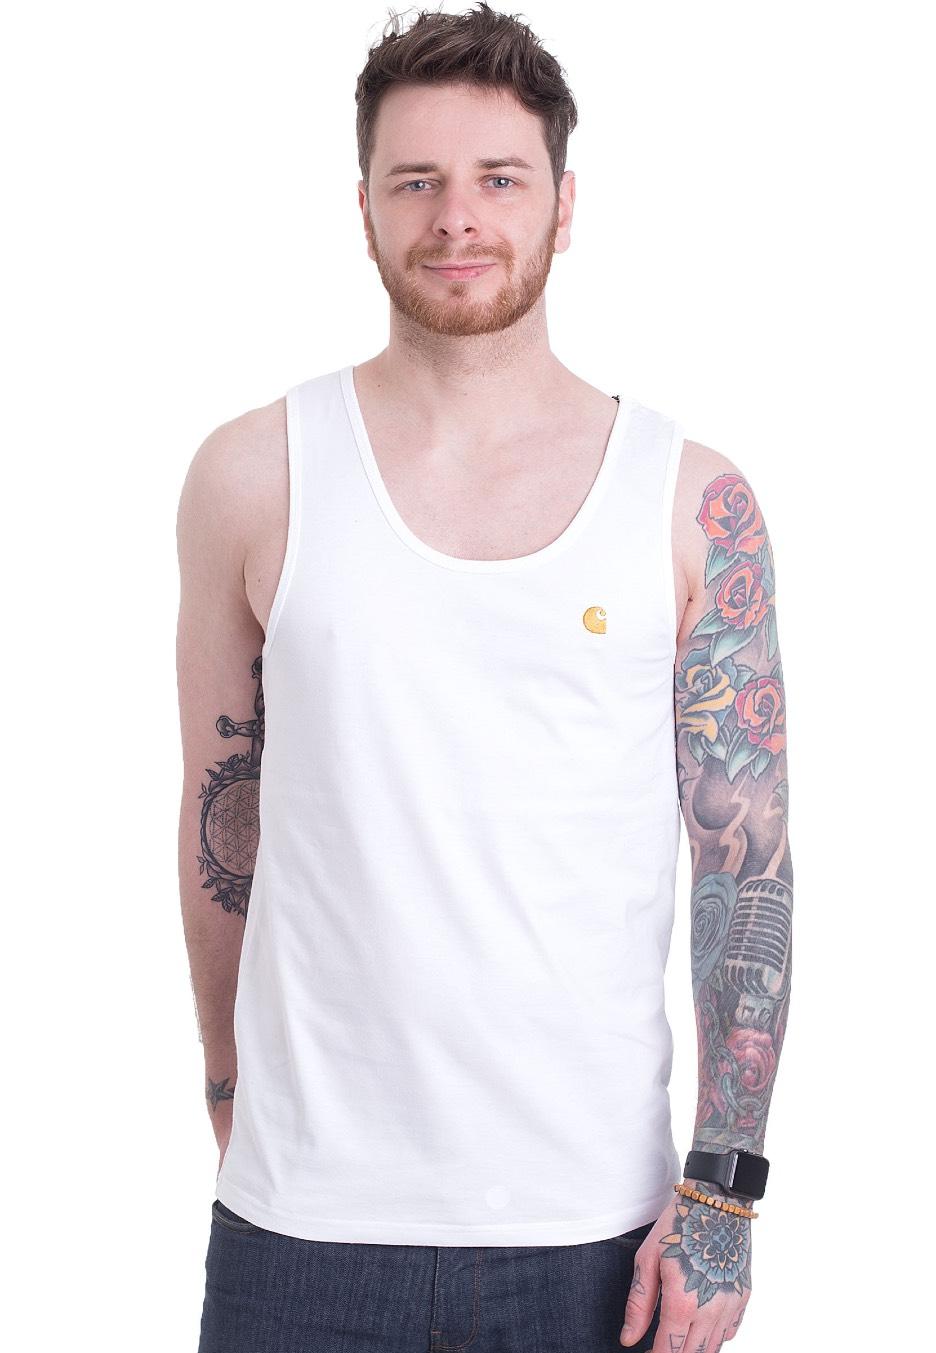 f28e57e1 Carhartt WIP - Chase A-Shirt White/Gold - Tank - Streetwear Shop -  Impericon.com UK